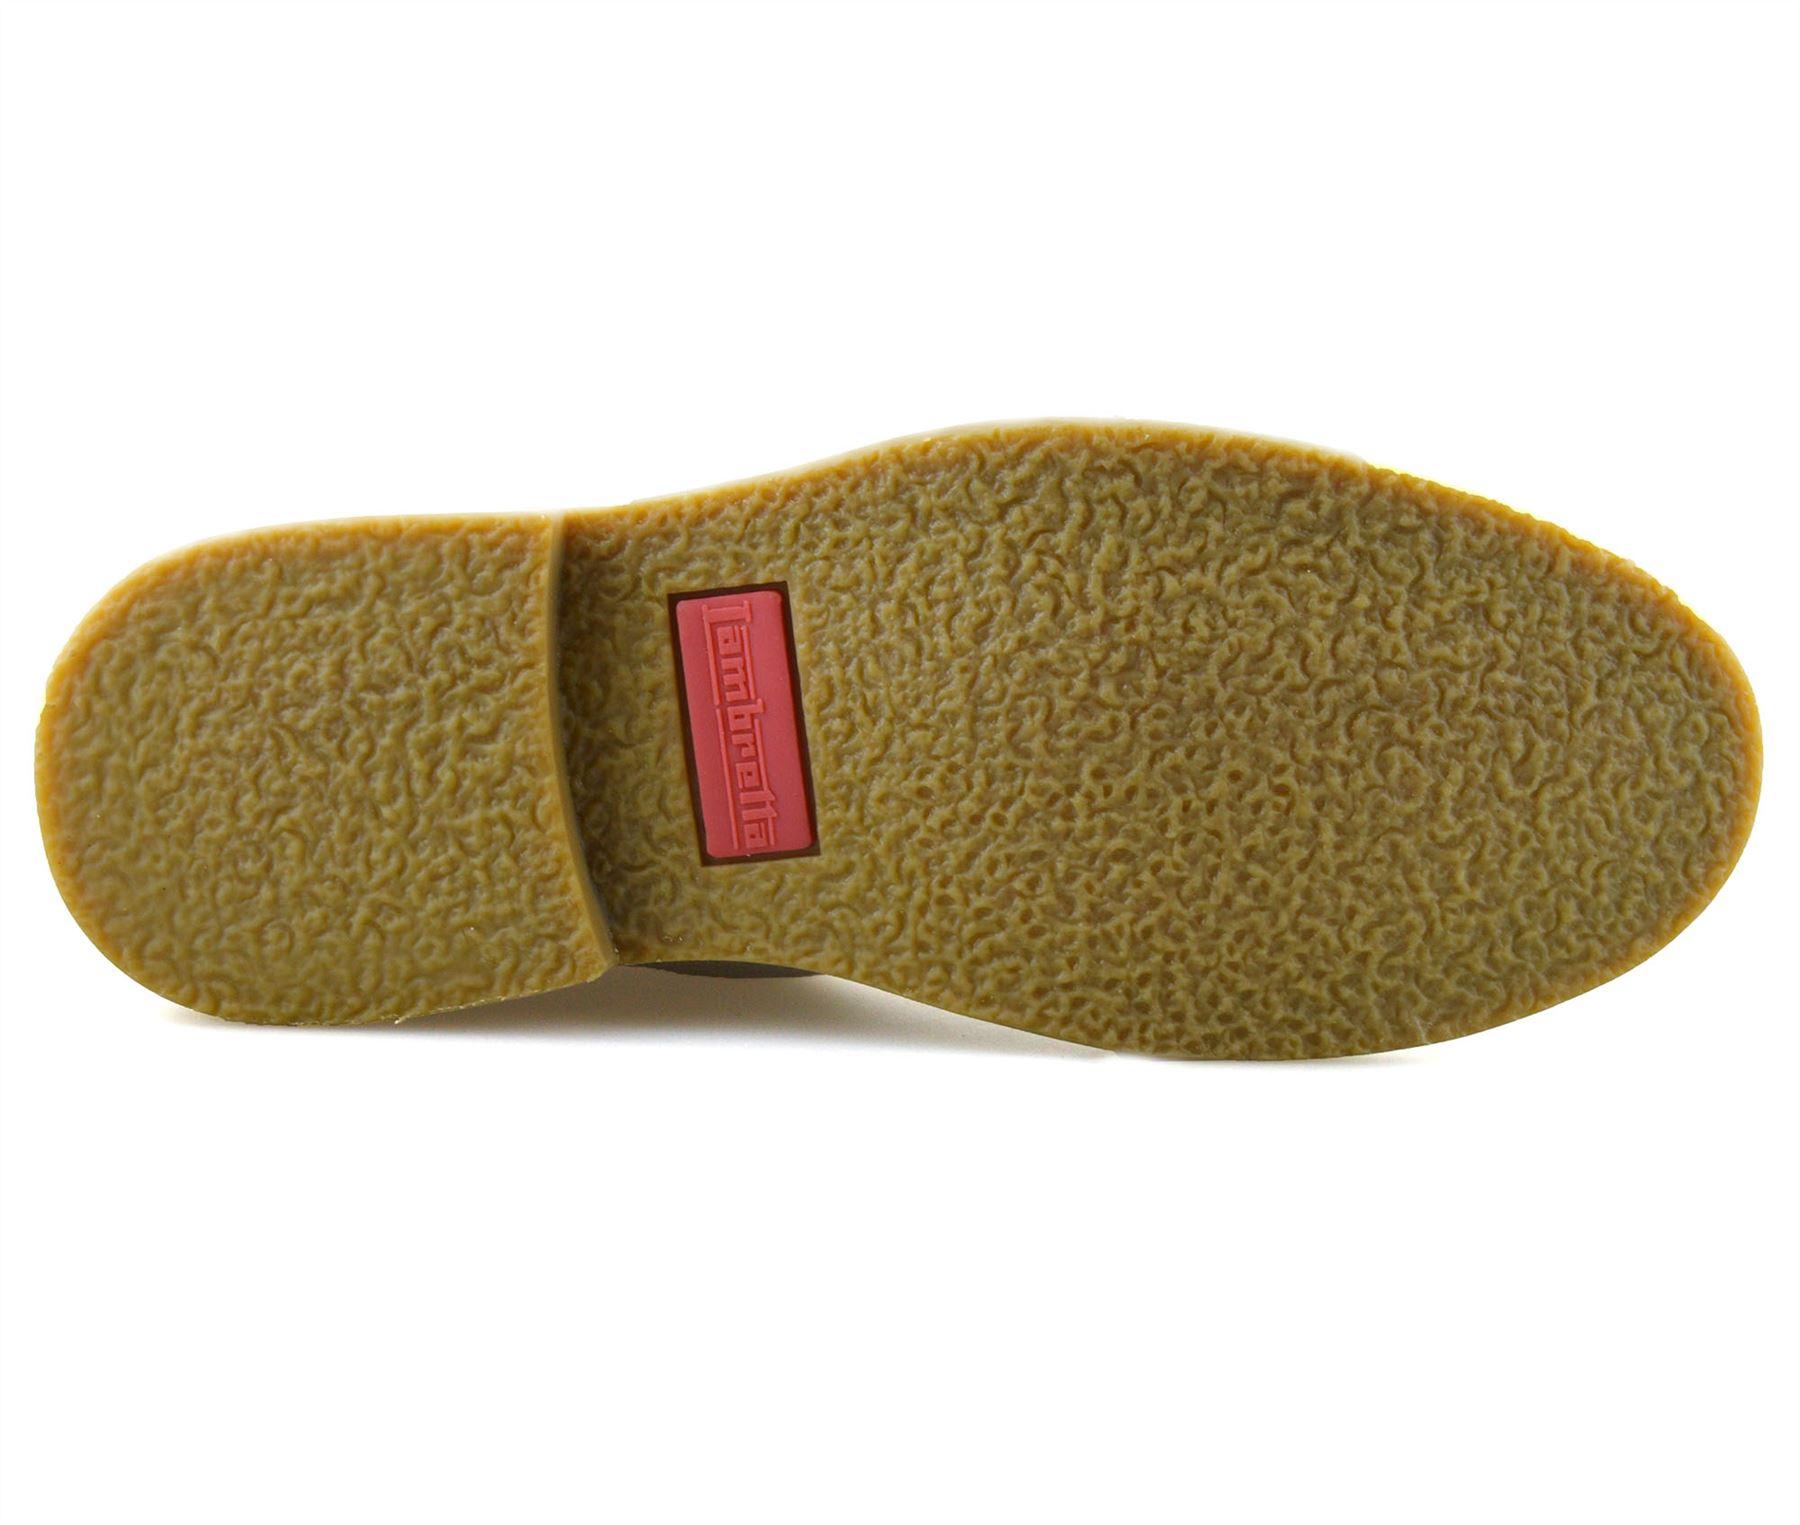 Homme-Lambretta-Cuir-Daim-Decontracte-Chukka-a-Lacets-Desert-Bottes-Chaussures-Taille miniature 10